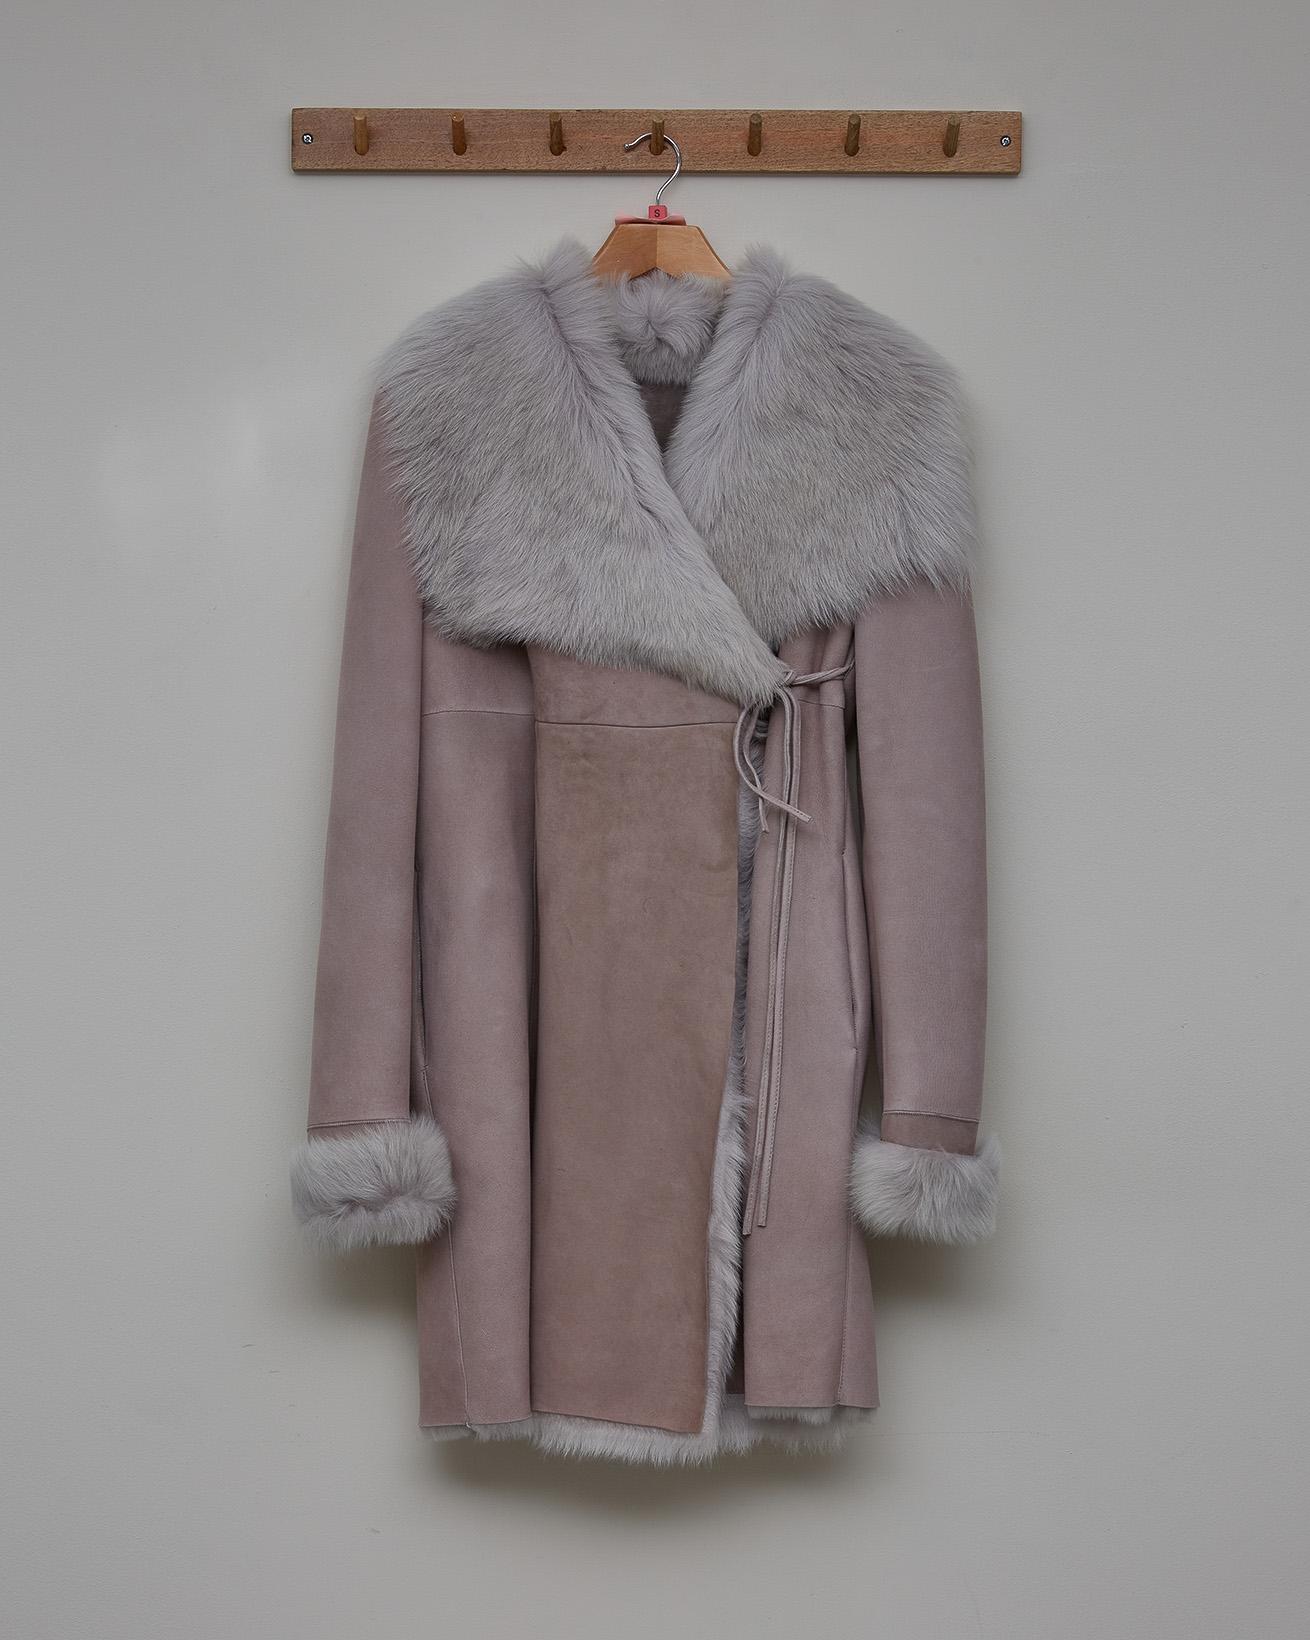 Toscana Trim Wrap Coat - Taupe Grey - Size 10 - 2787